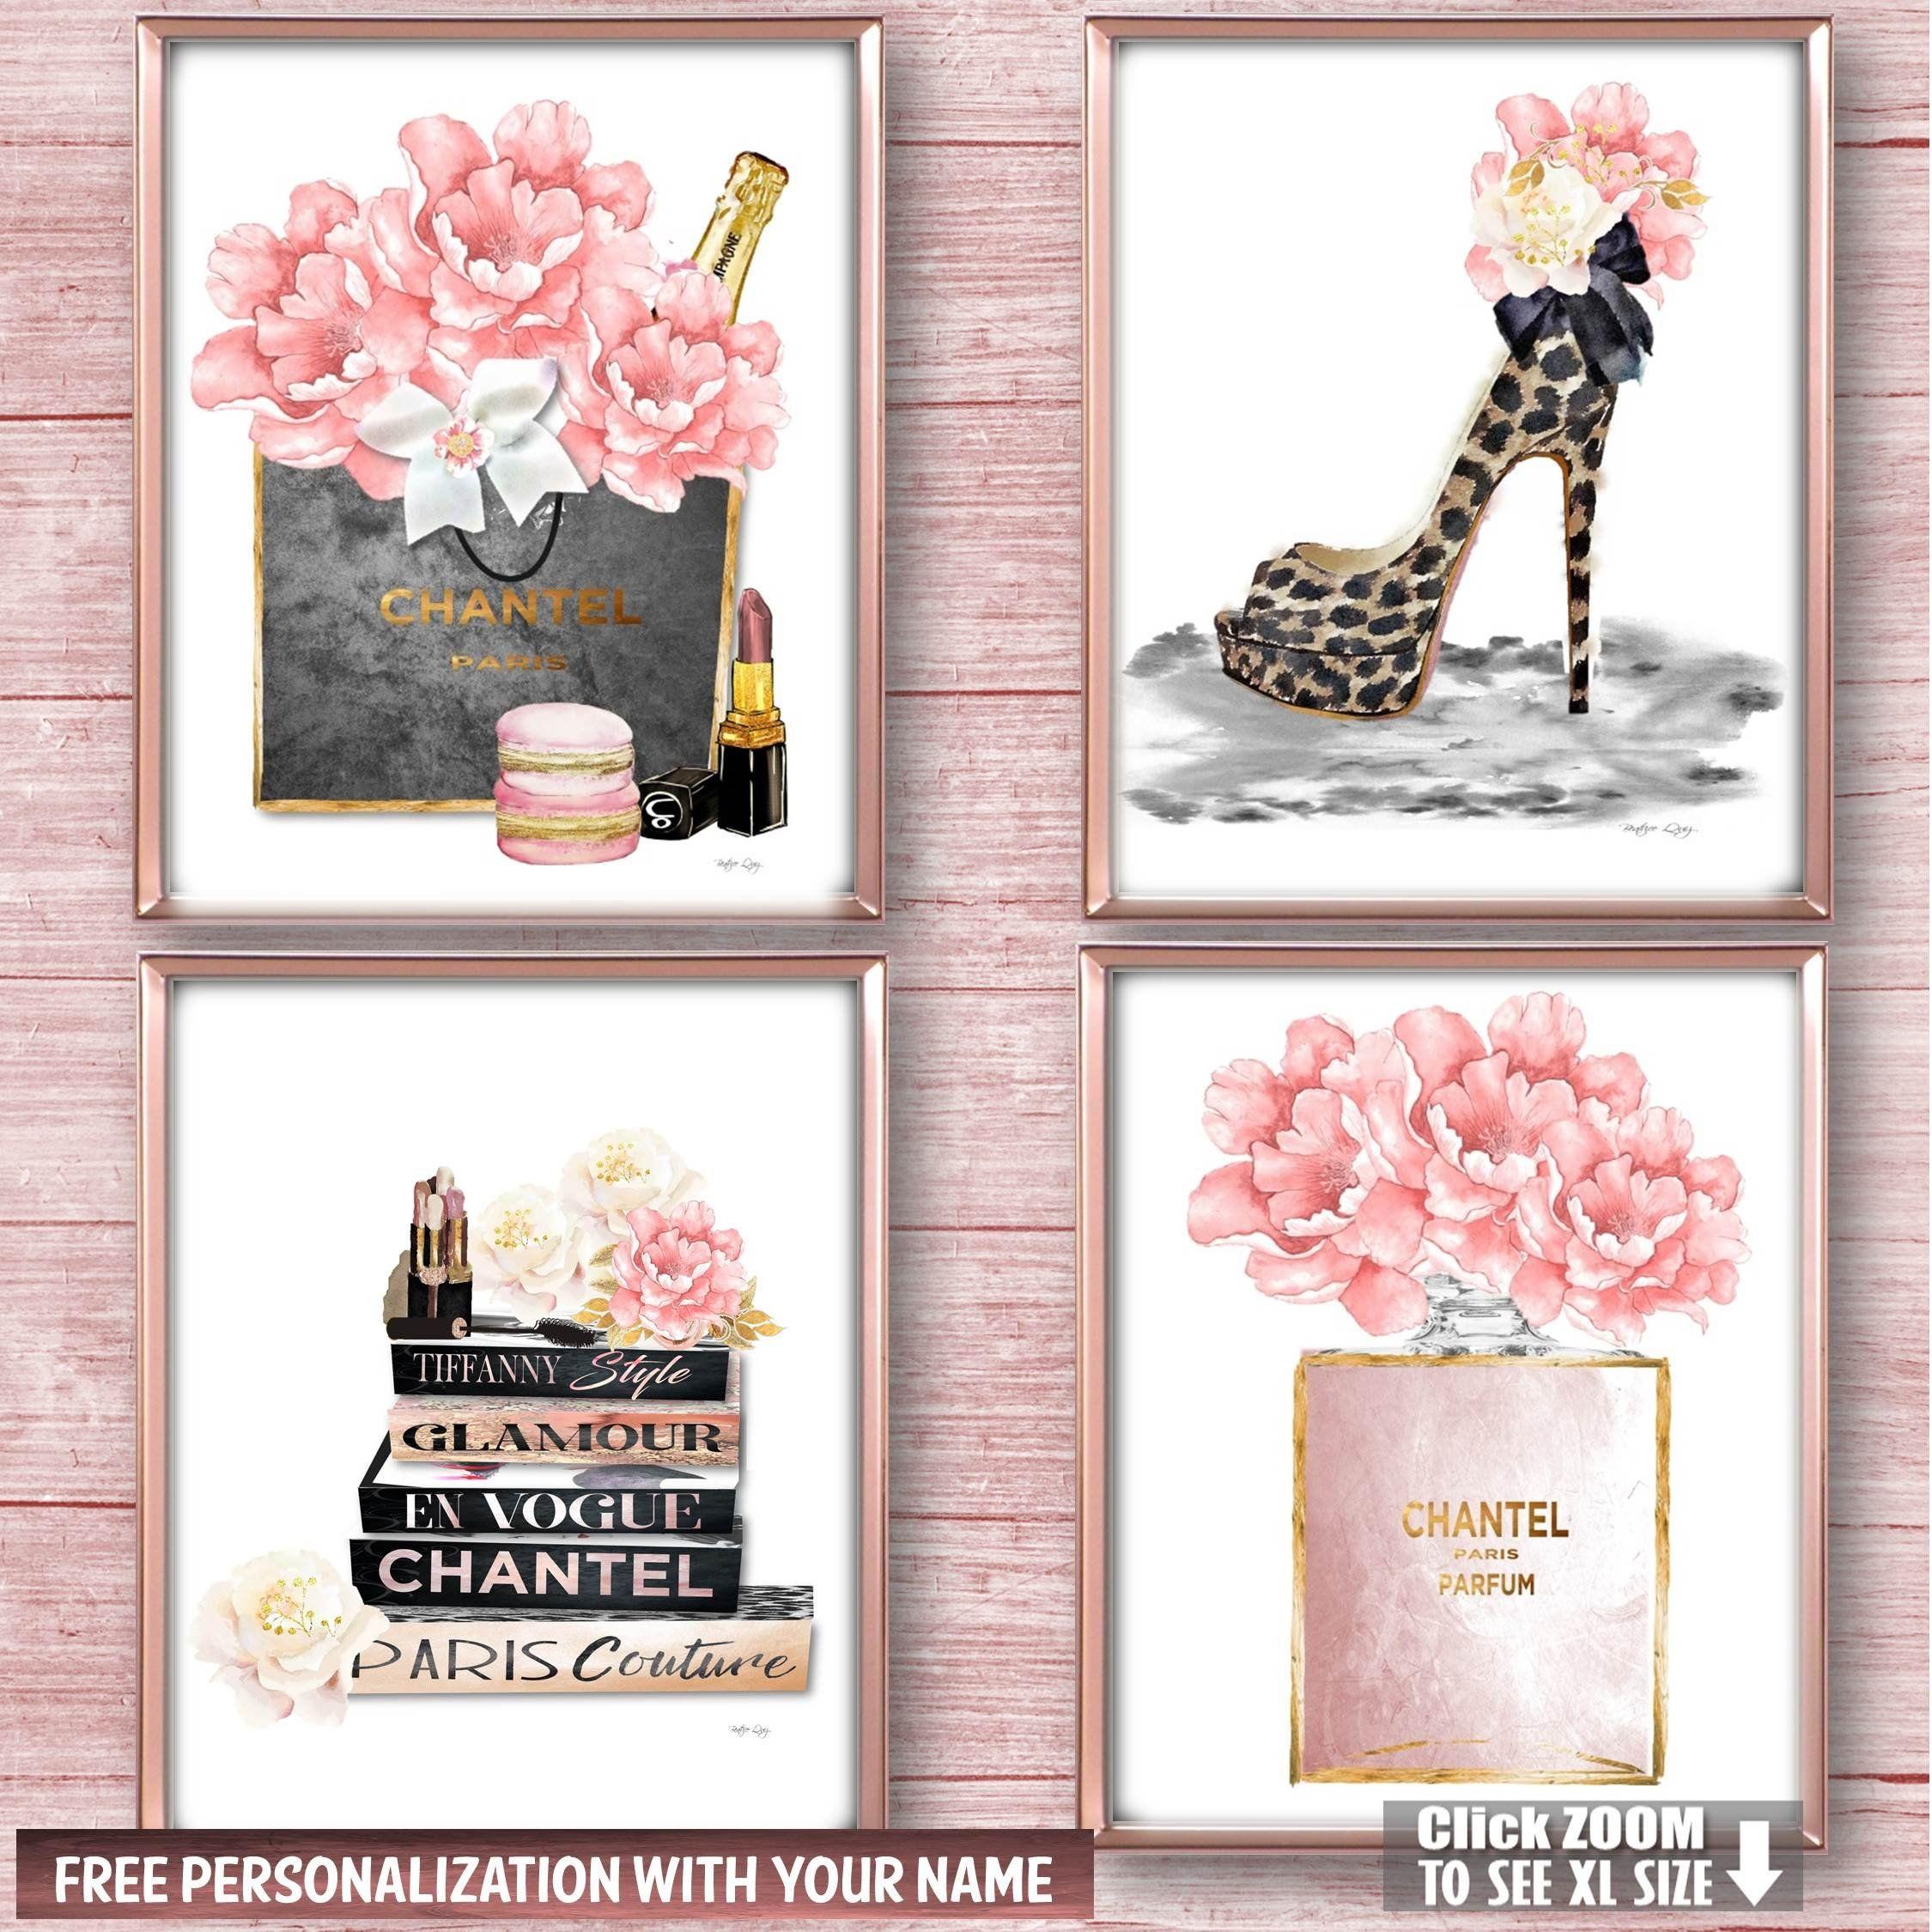 Fashion Prints Fashion Decor Set Fashion Art Fashion Gift Fashion Illustration Fashion Poster Fashion Sketch High Heel Fashion Books Perfume Fashion Wall Decor Fashion Wall Art Bedroom Wall Art